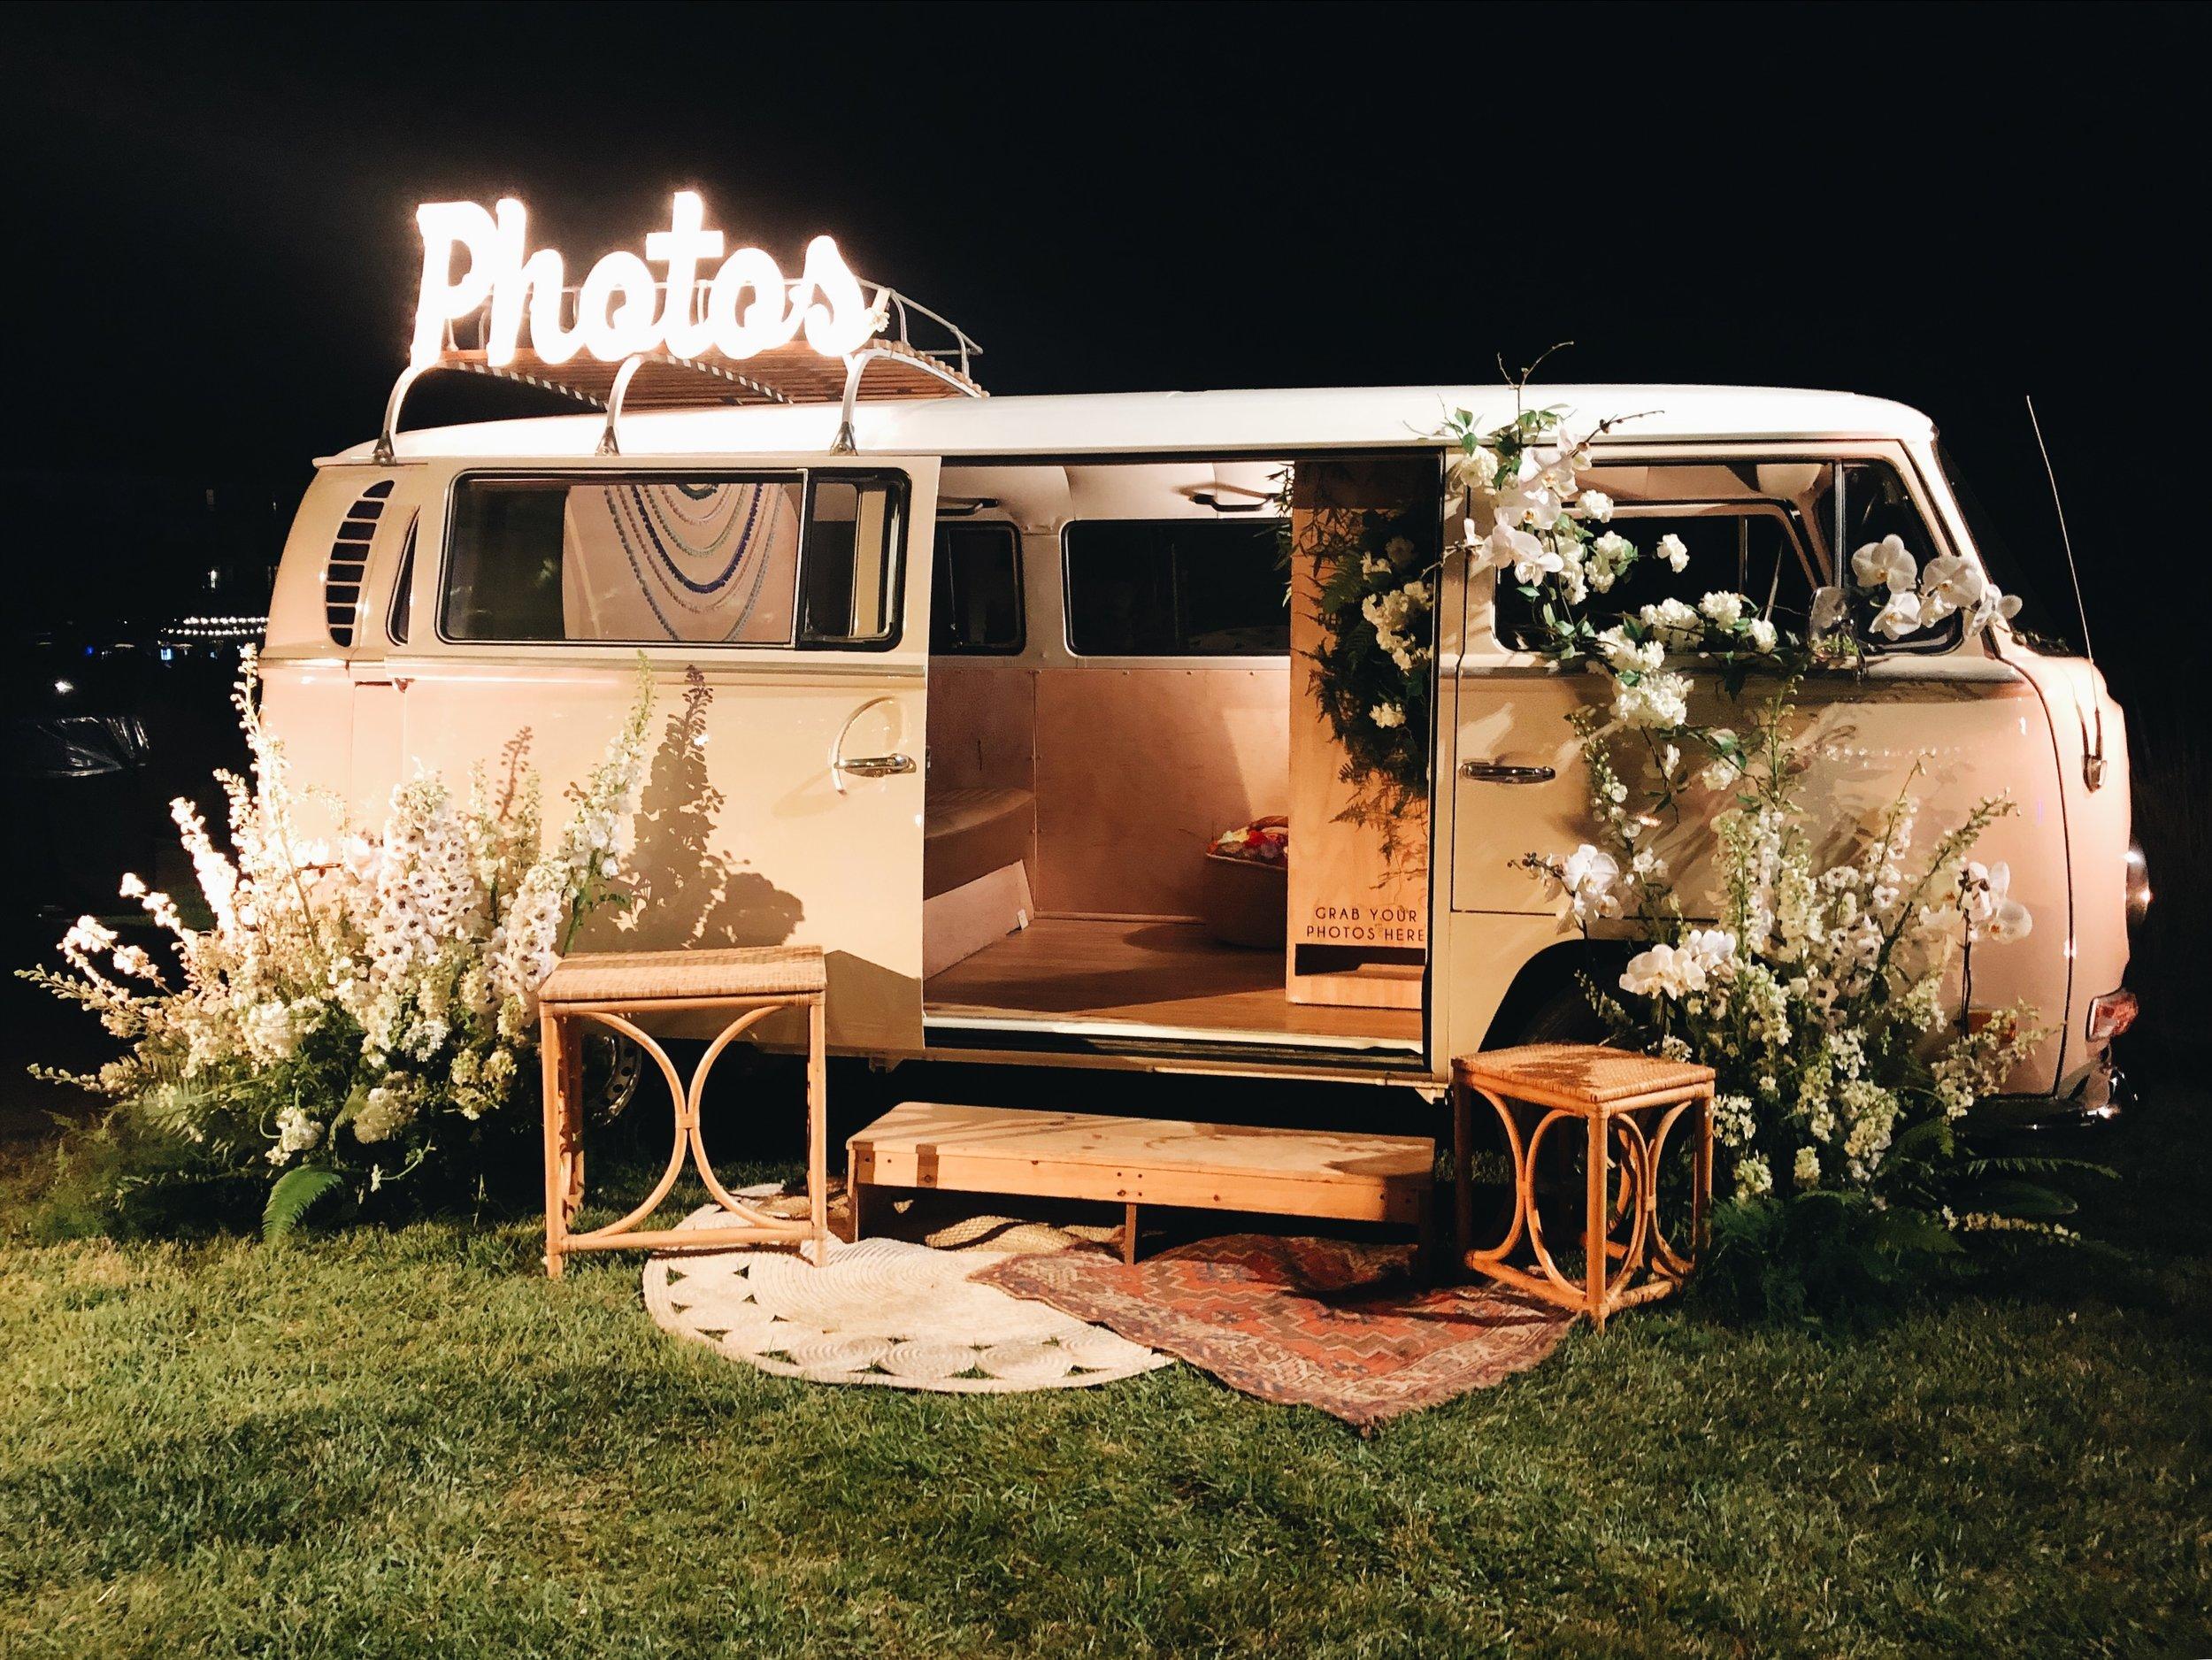 Photo-Booth-Bus-Volkswagen-VW.JPG